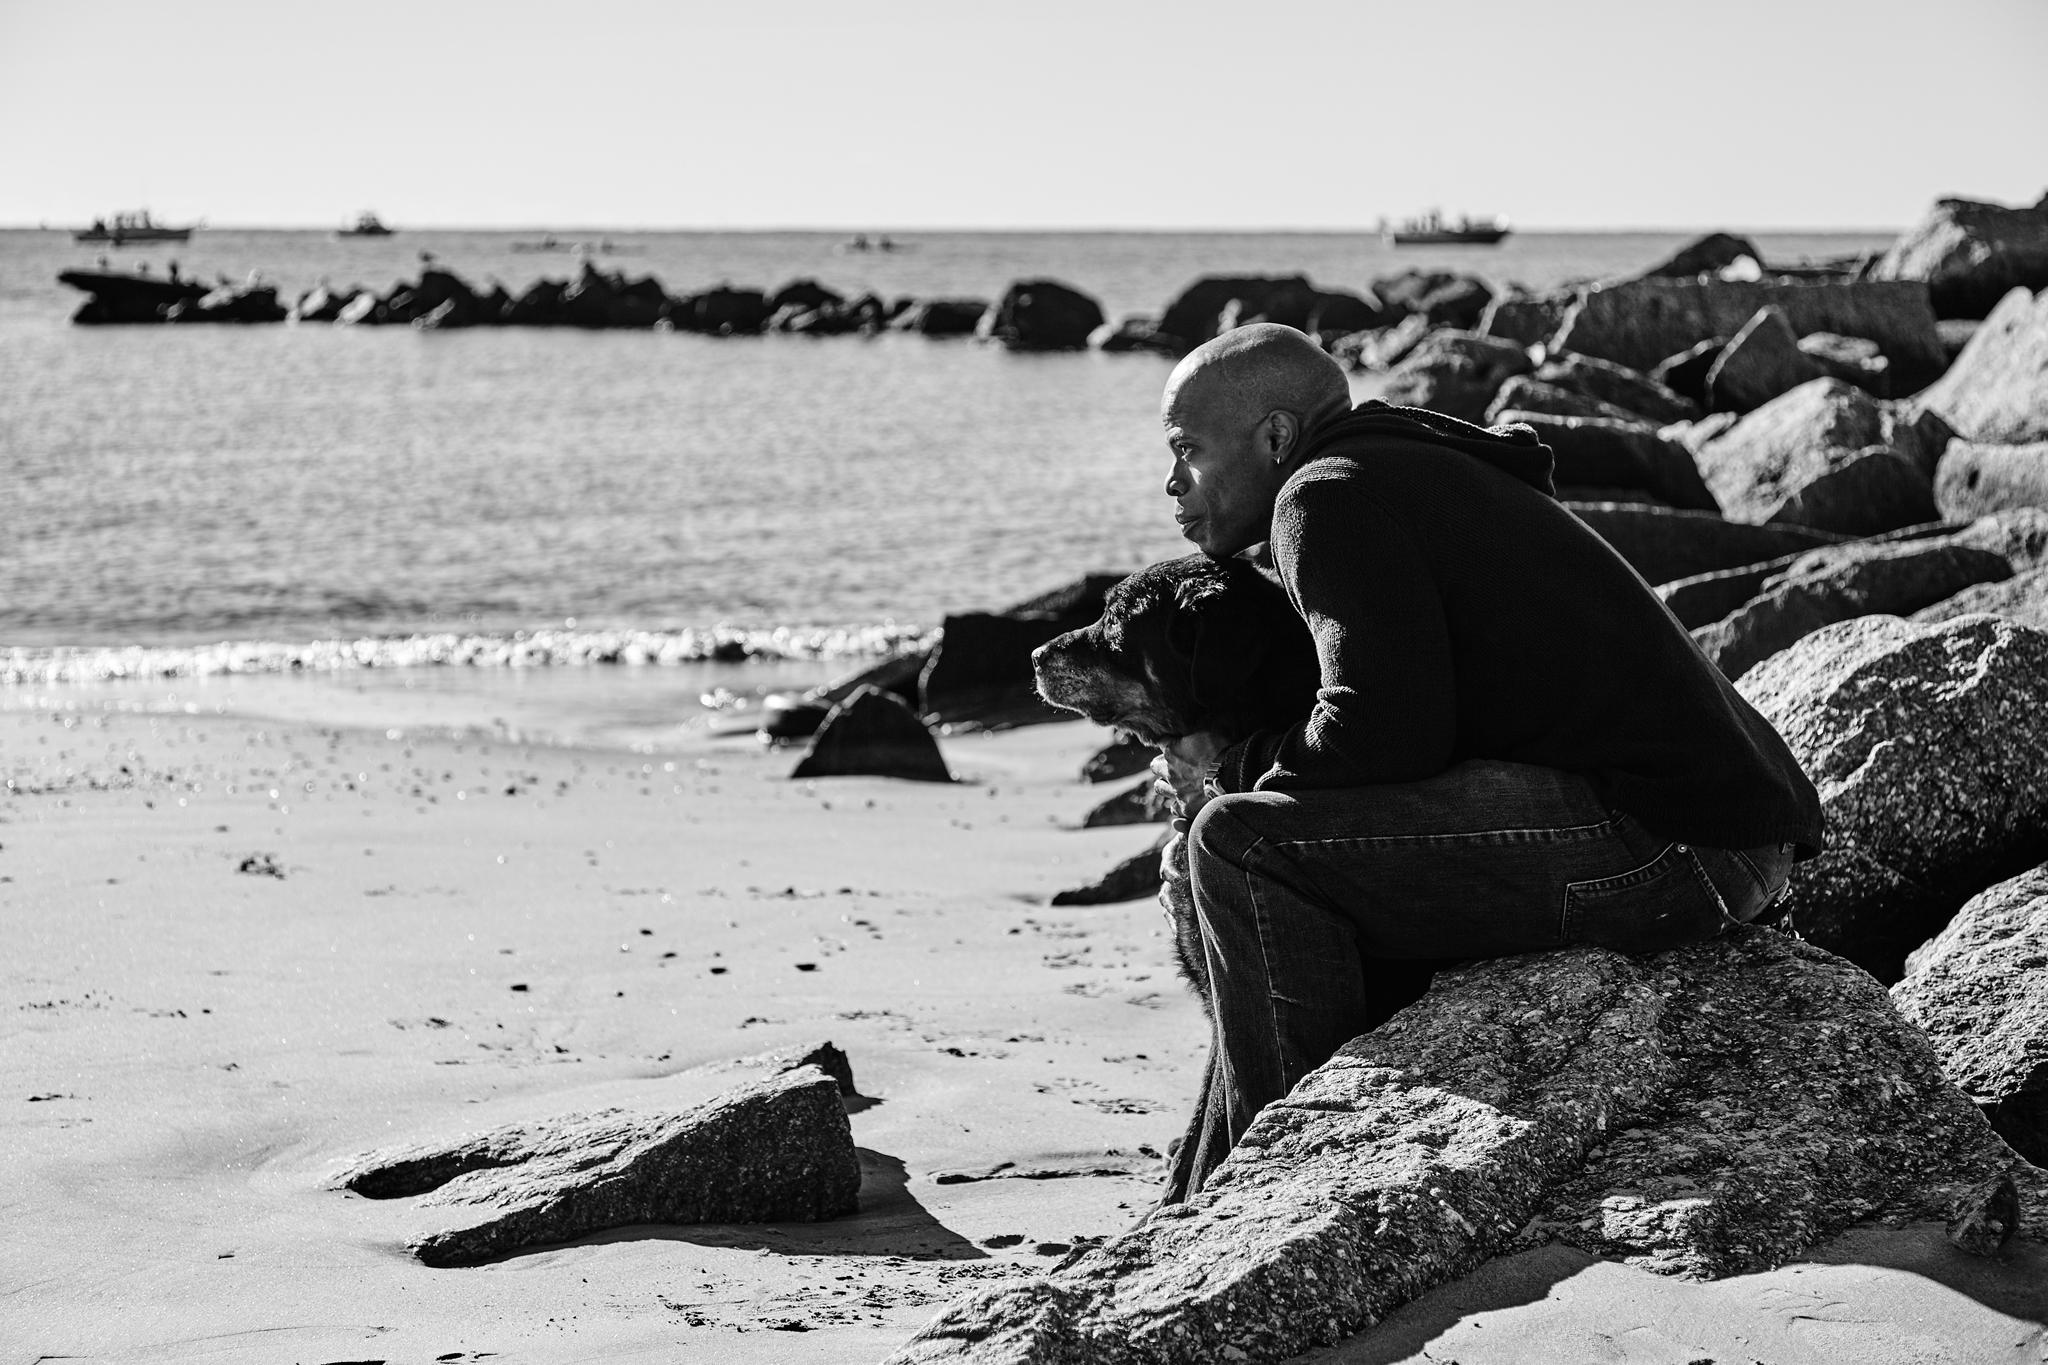 boprey-pet-photography-portrait-nyc_16.jpg